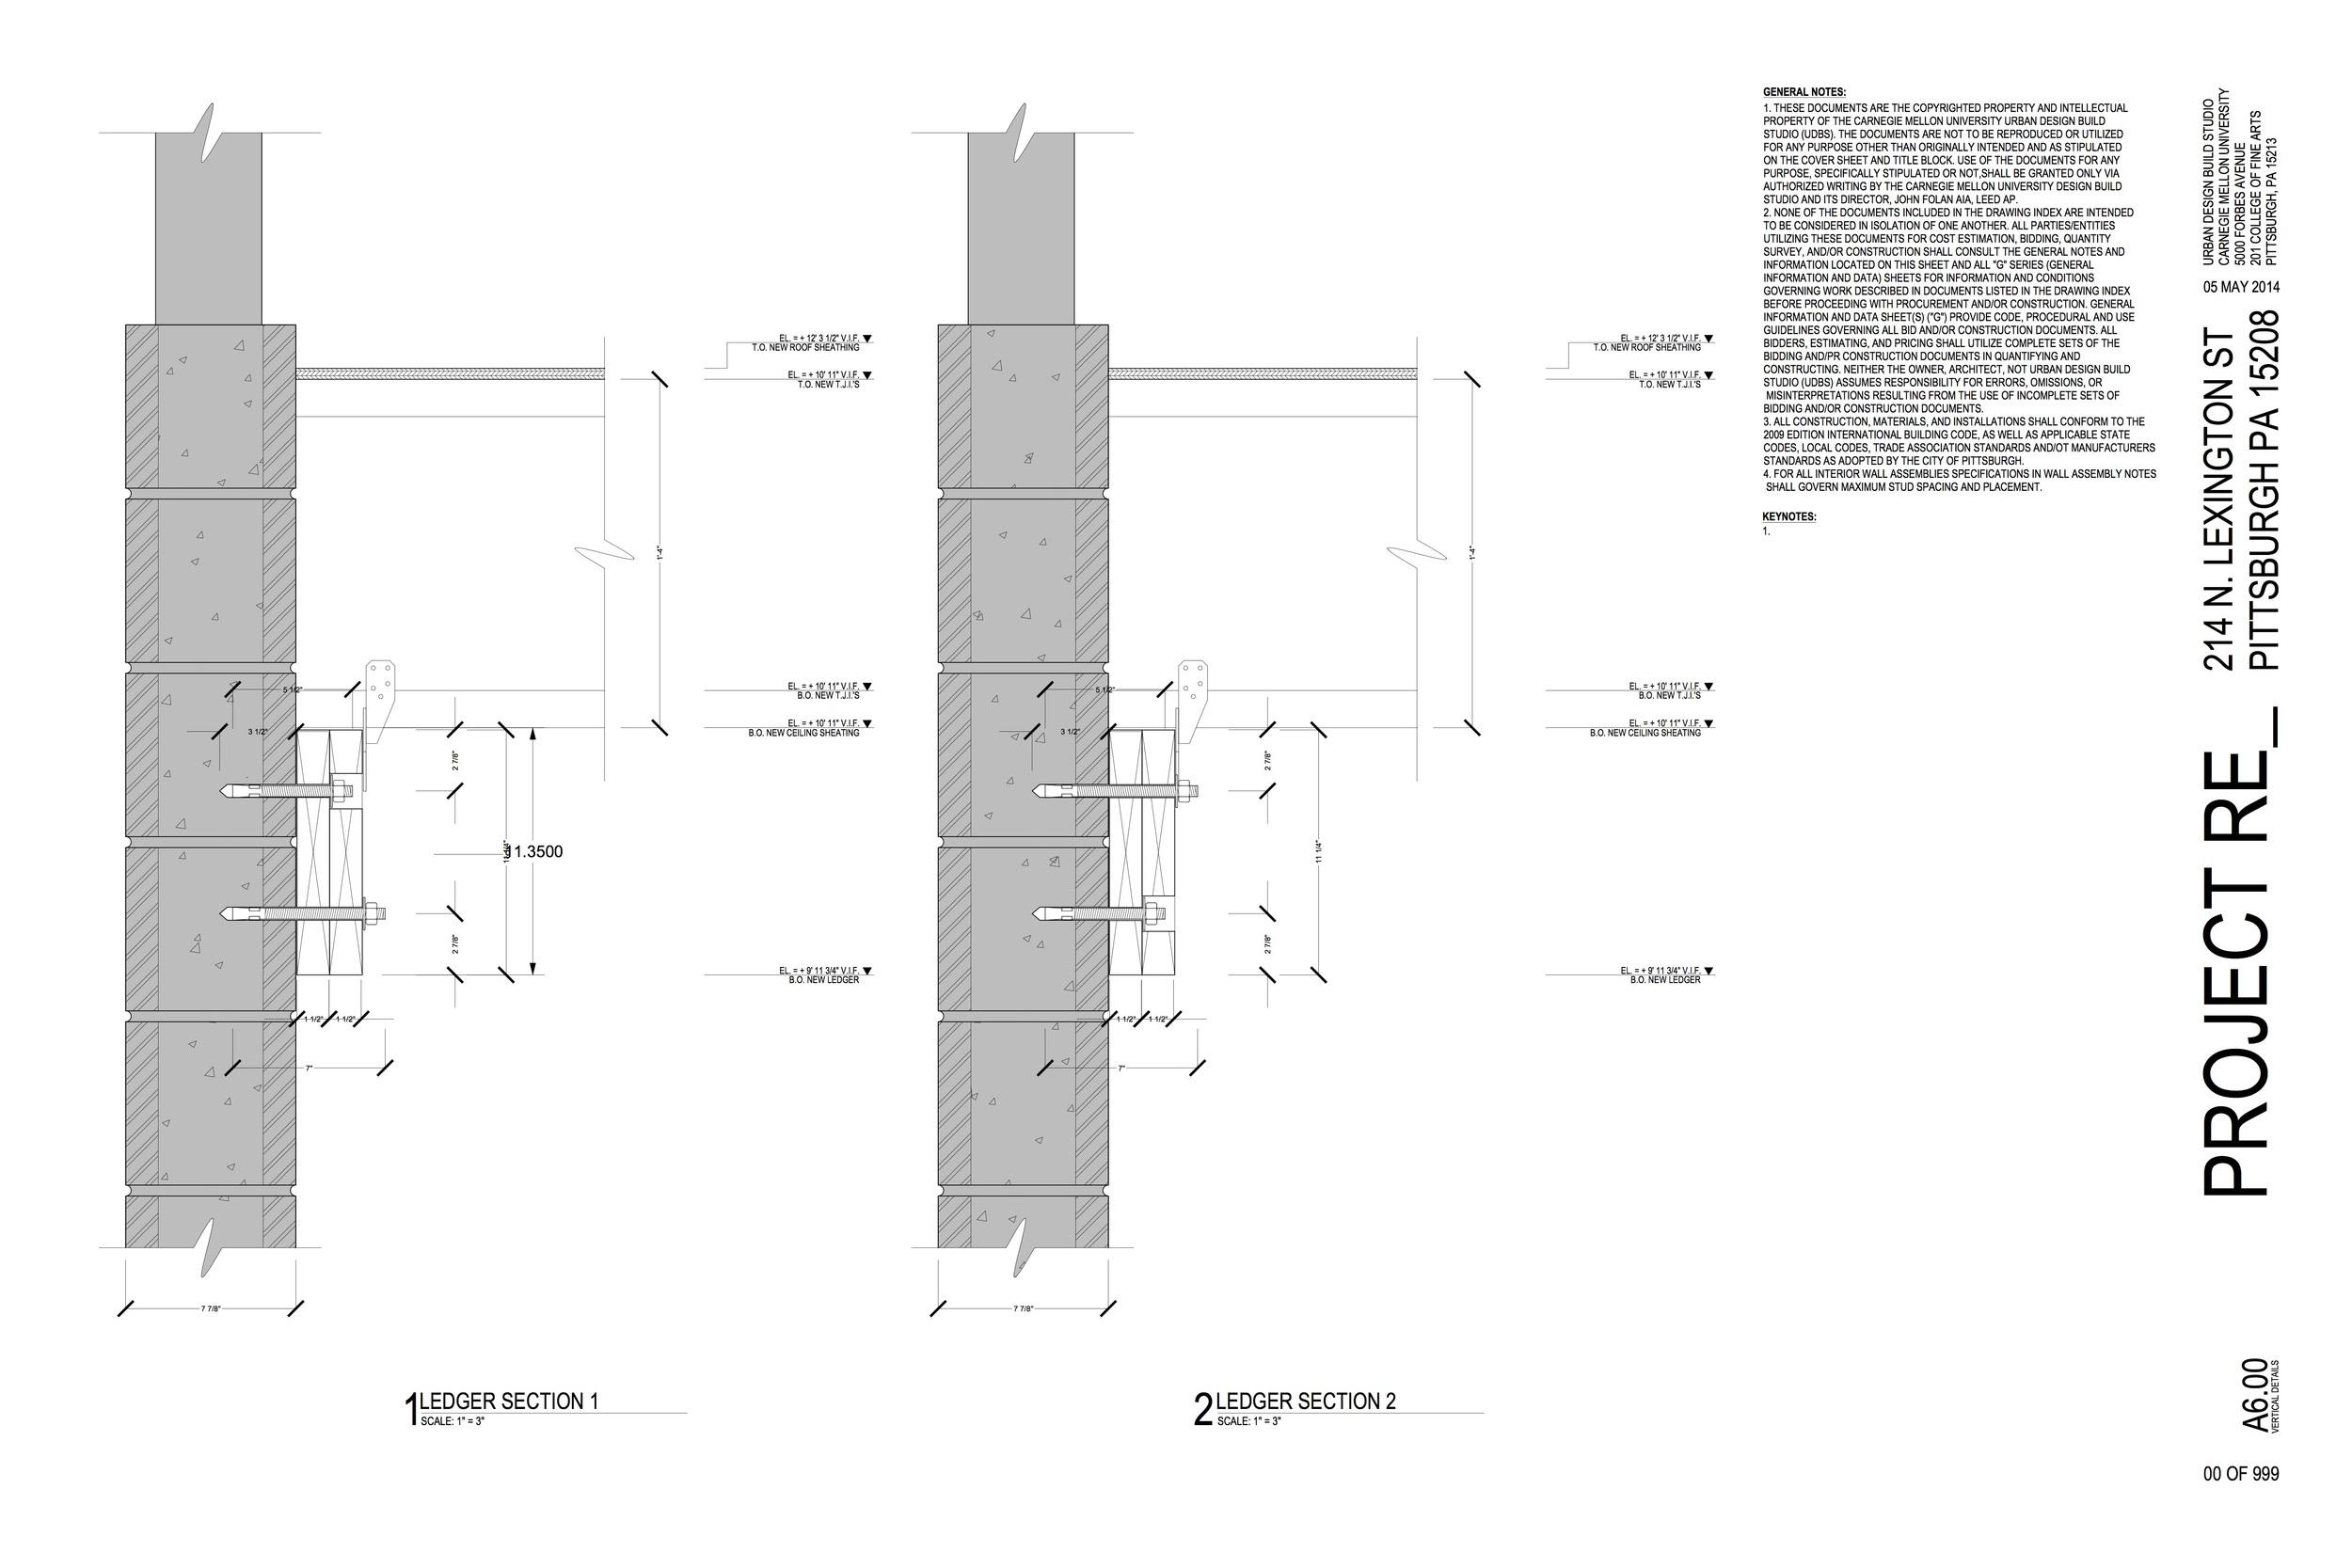 PRE_A6 VERTICAL DETAILS_V01_2014_05_05 (dragged).jpeg